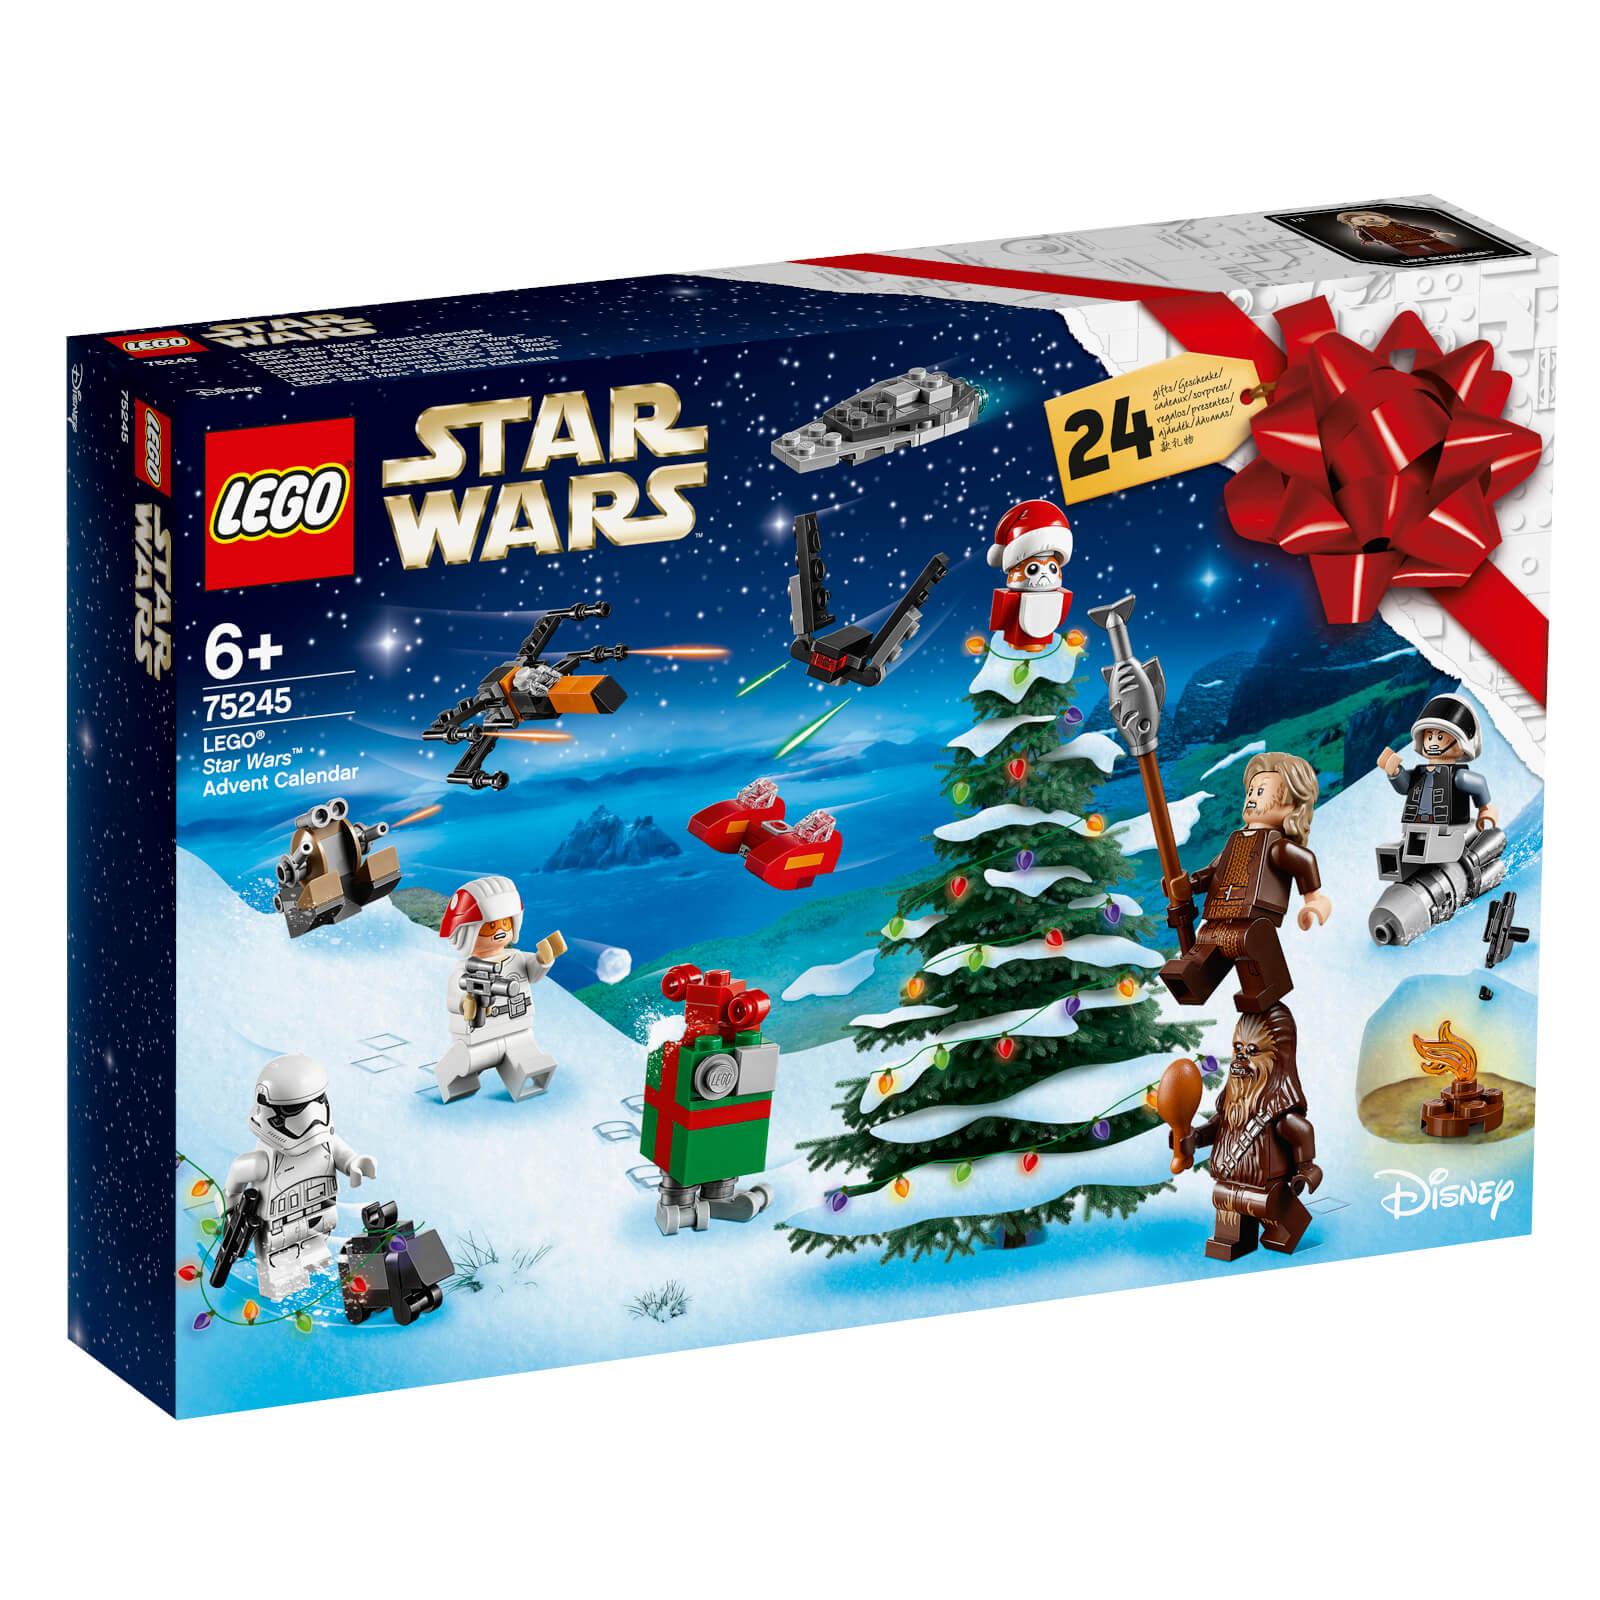 LEGO Star Wars Adventskalender 2019 (75245)